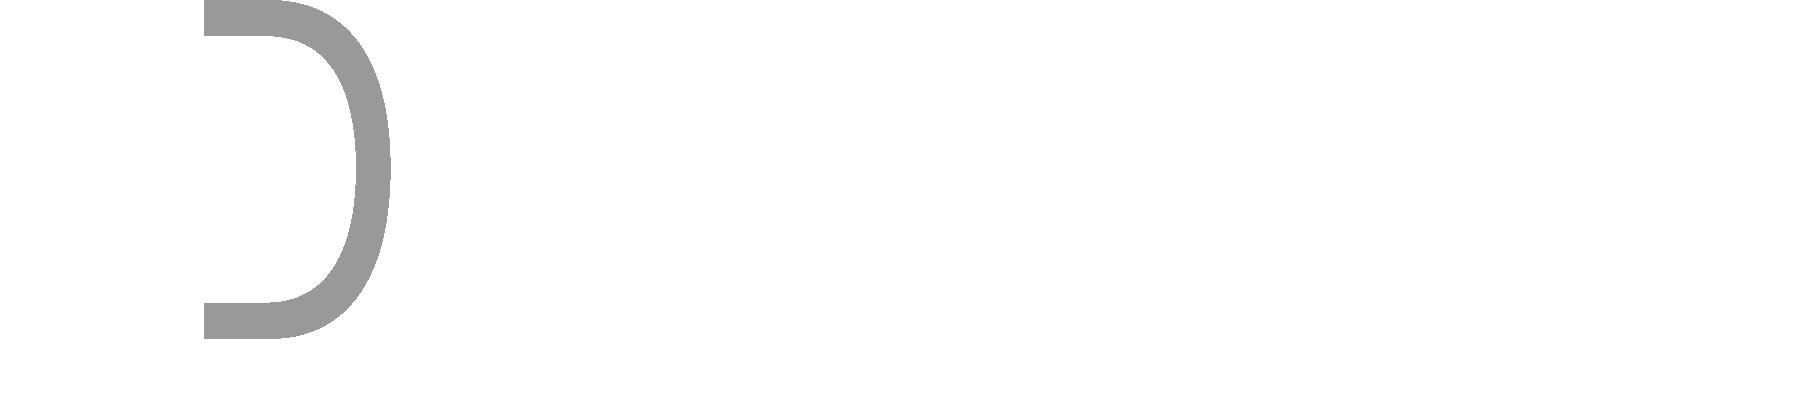 4D marketing logo